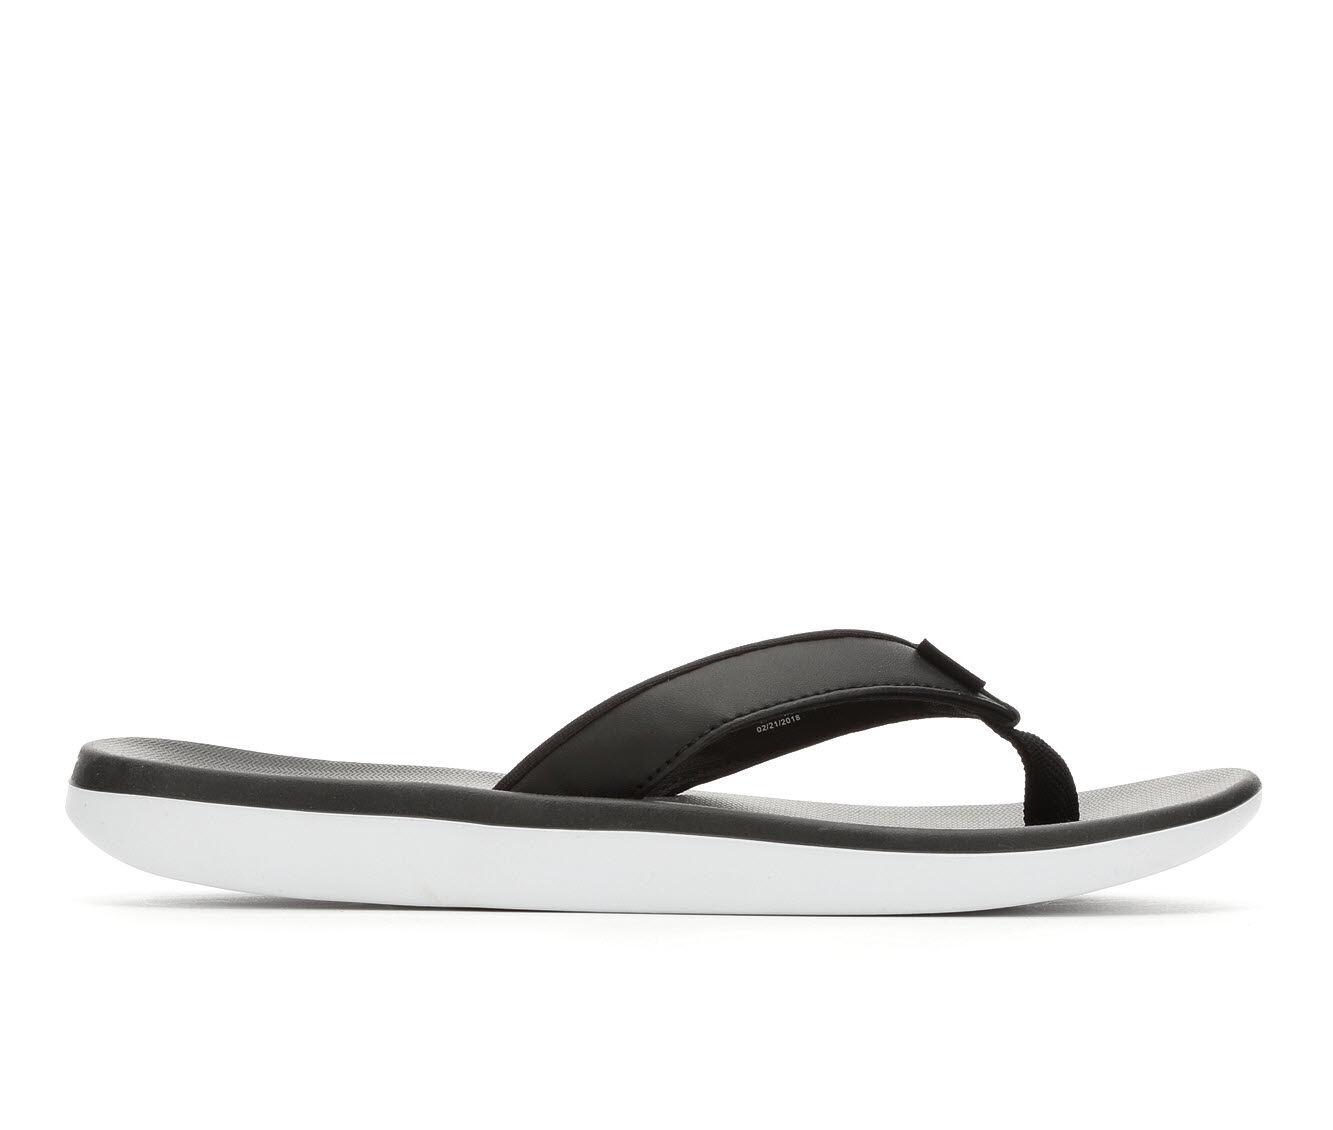 Women's Nike Bella Kai Thong Sport Sandals Blk/Met Silver